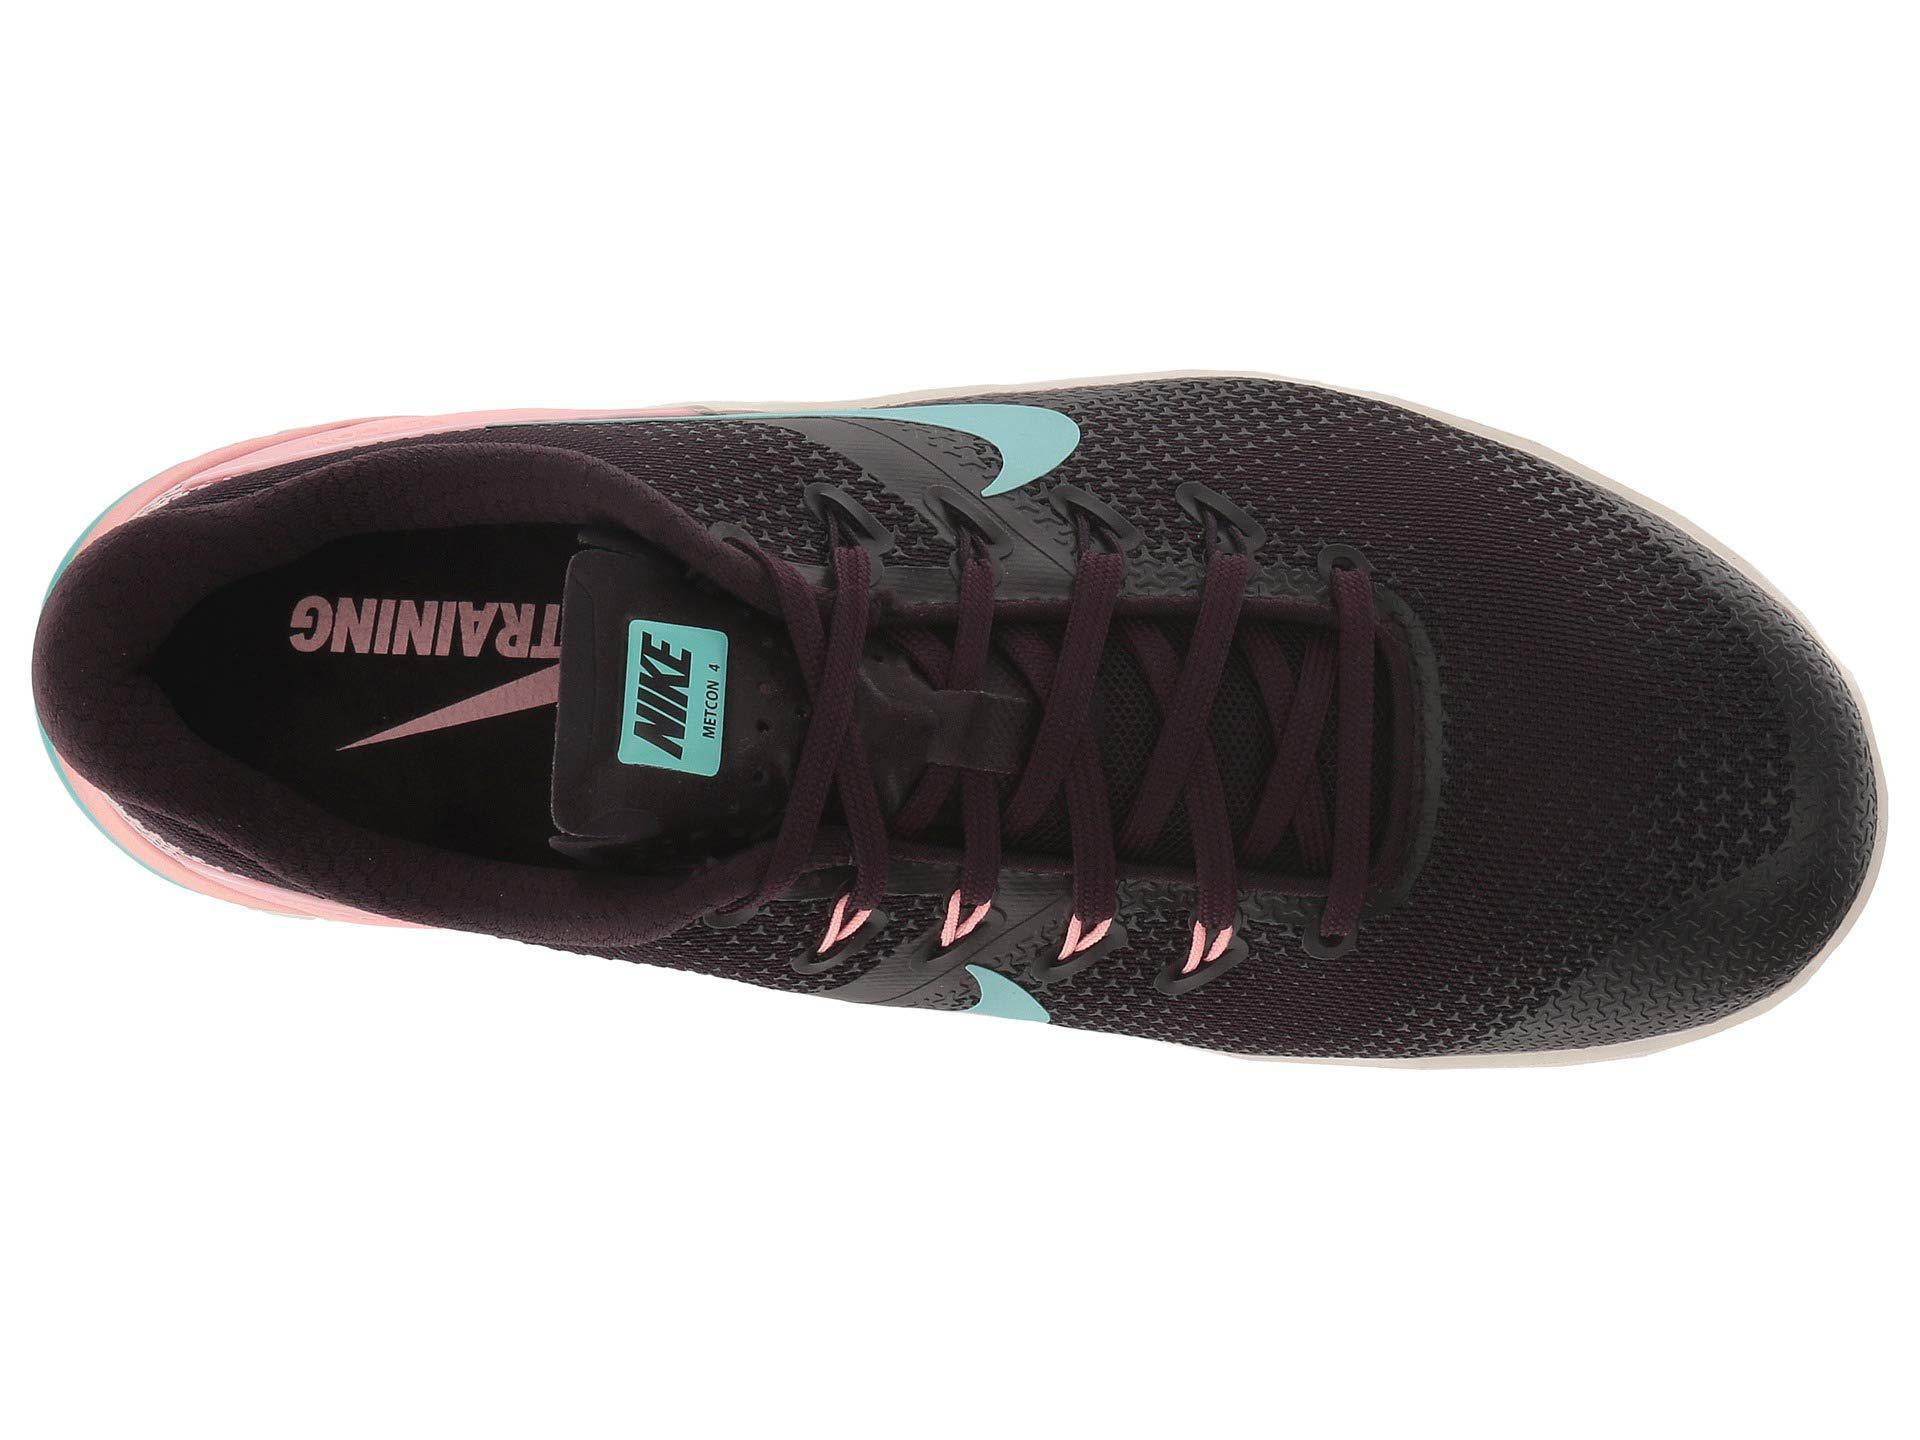 Lyst - Nike Metcon 4 (black metallic Silver white volt Glow) Women s ... 68cb3086f